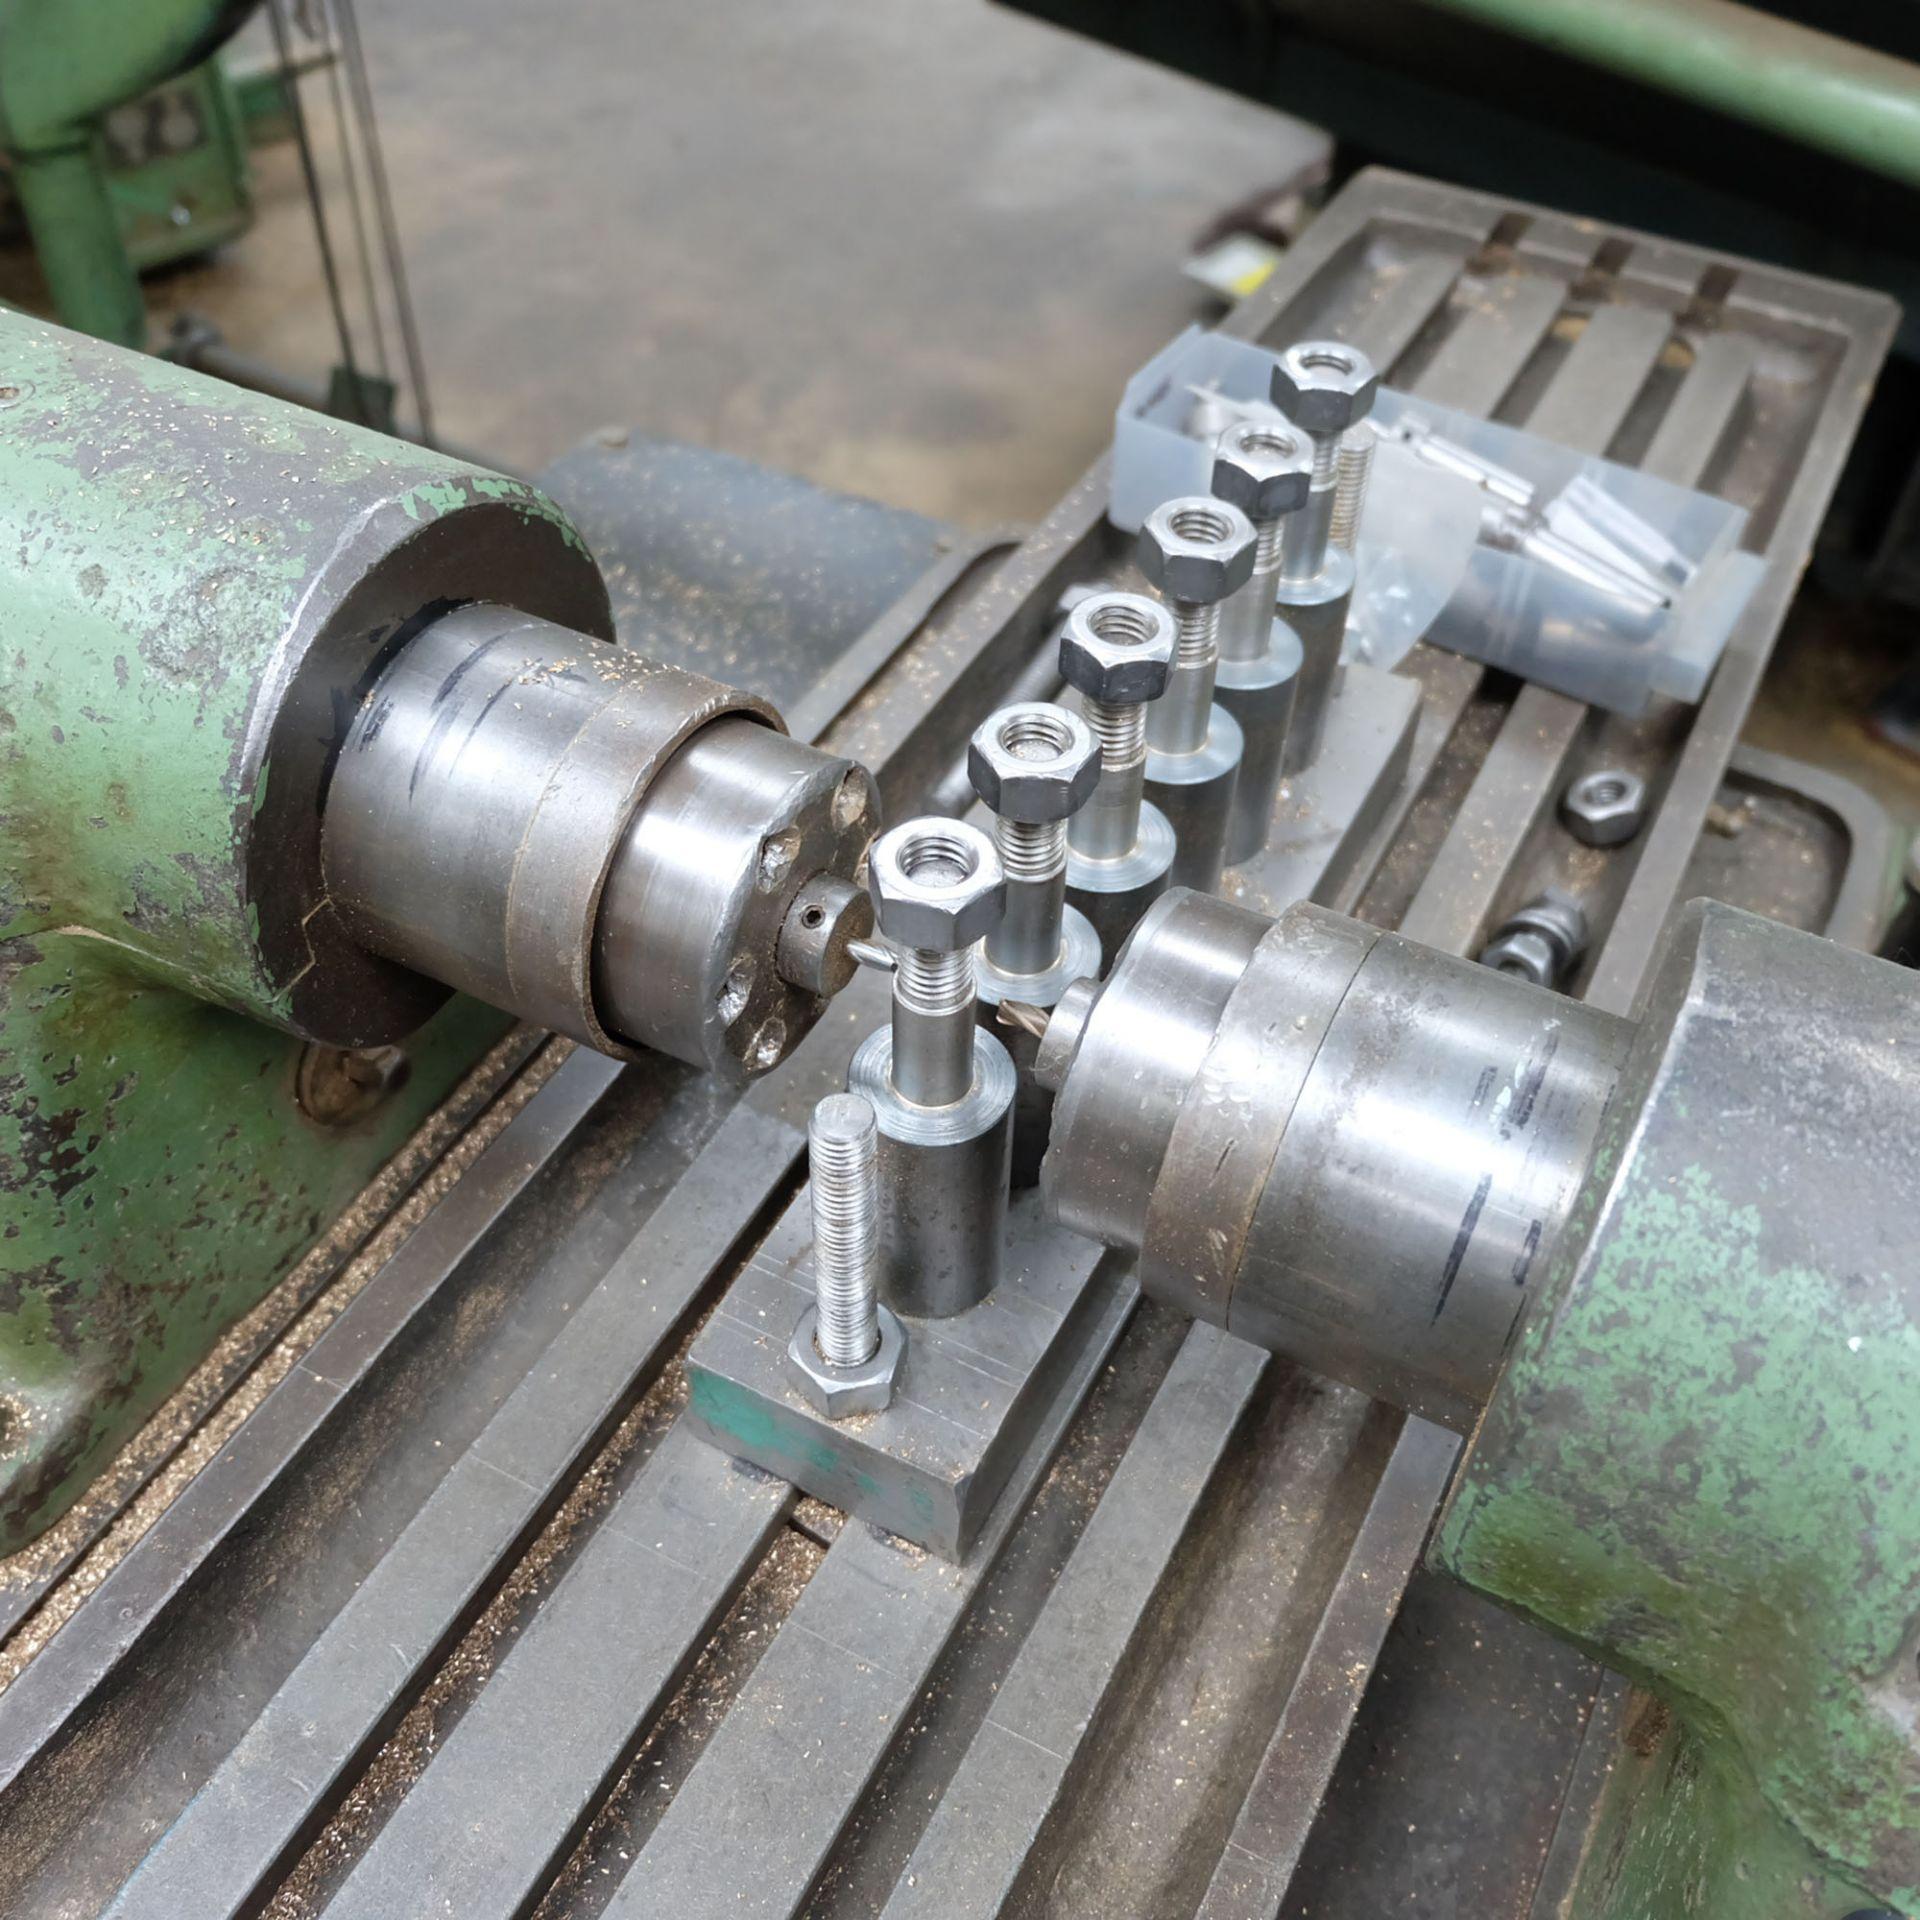 Jones & Shipman Model 745 Hydro Slot Milling Machine. - Image 3 of 5